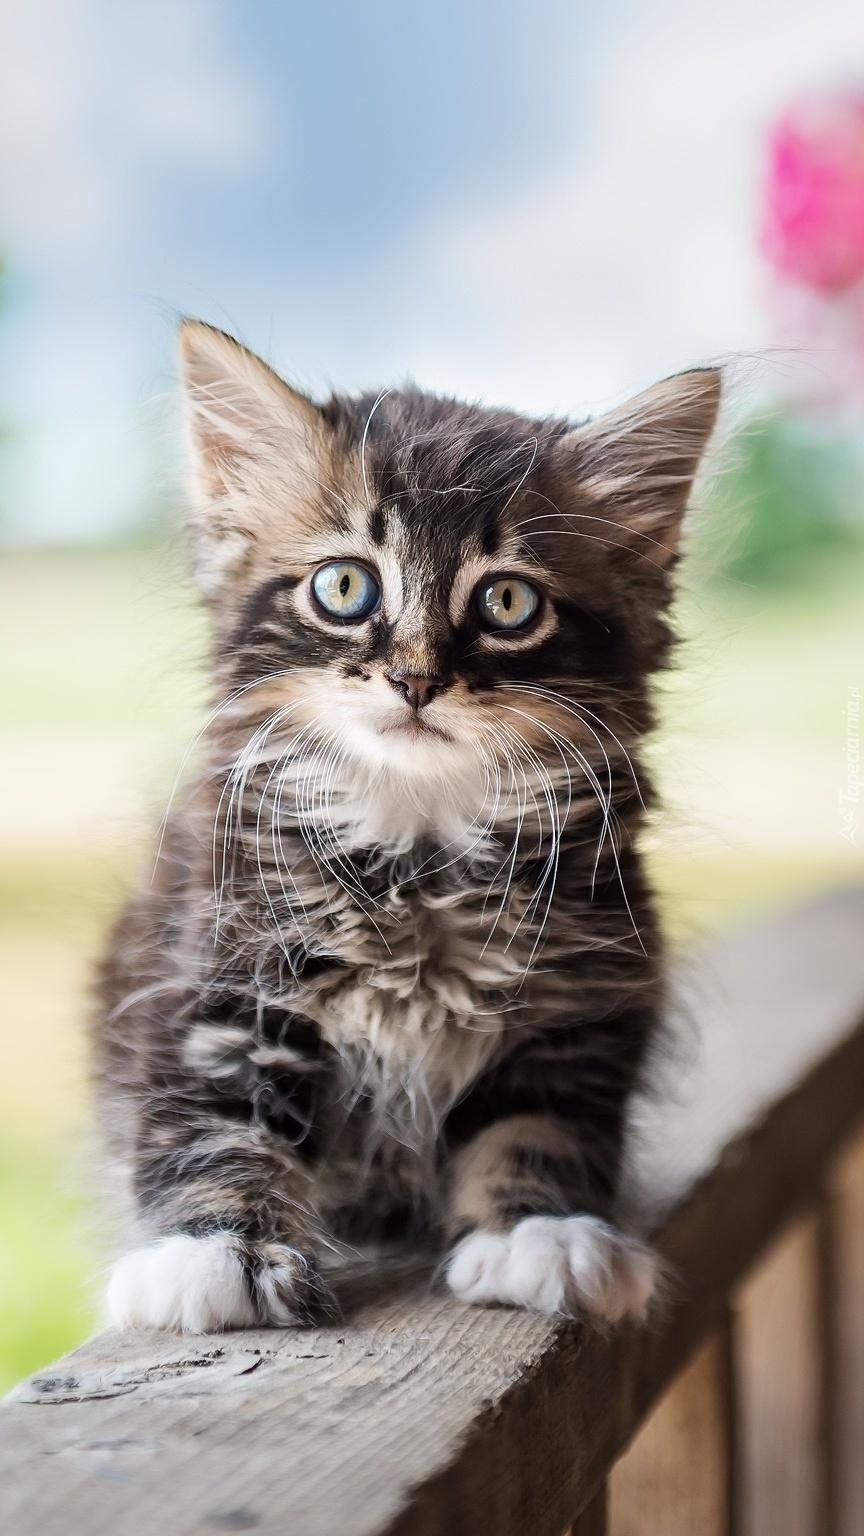 Kotek na poręczy